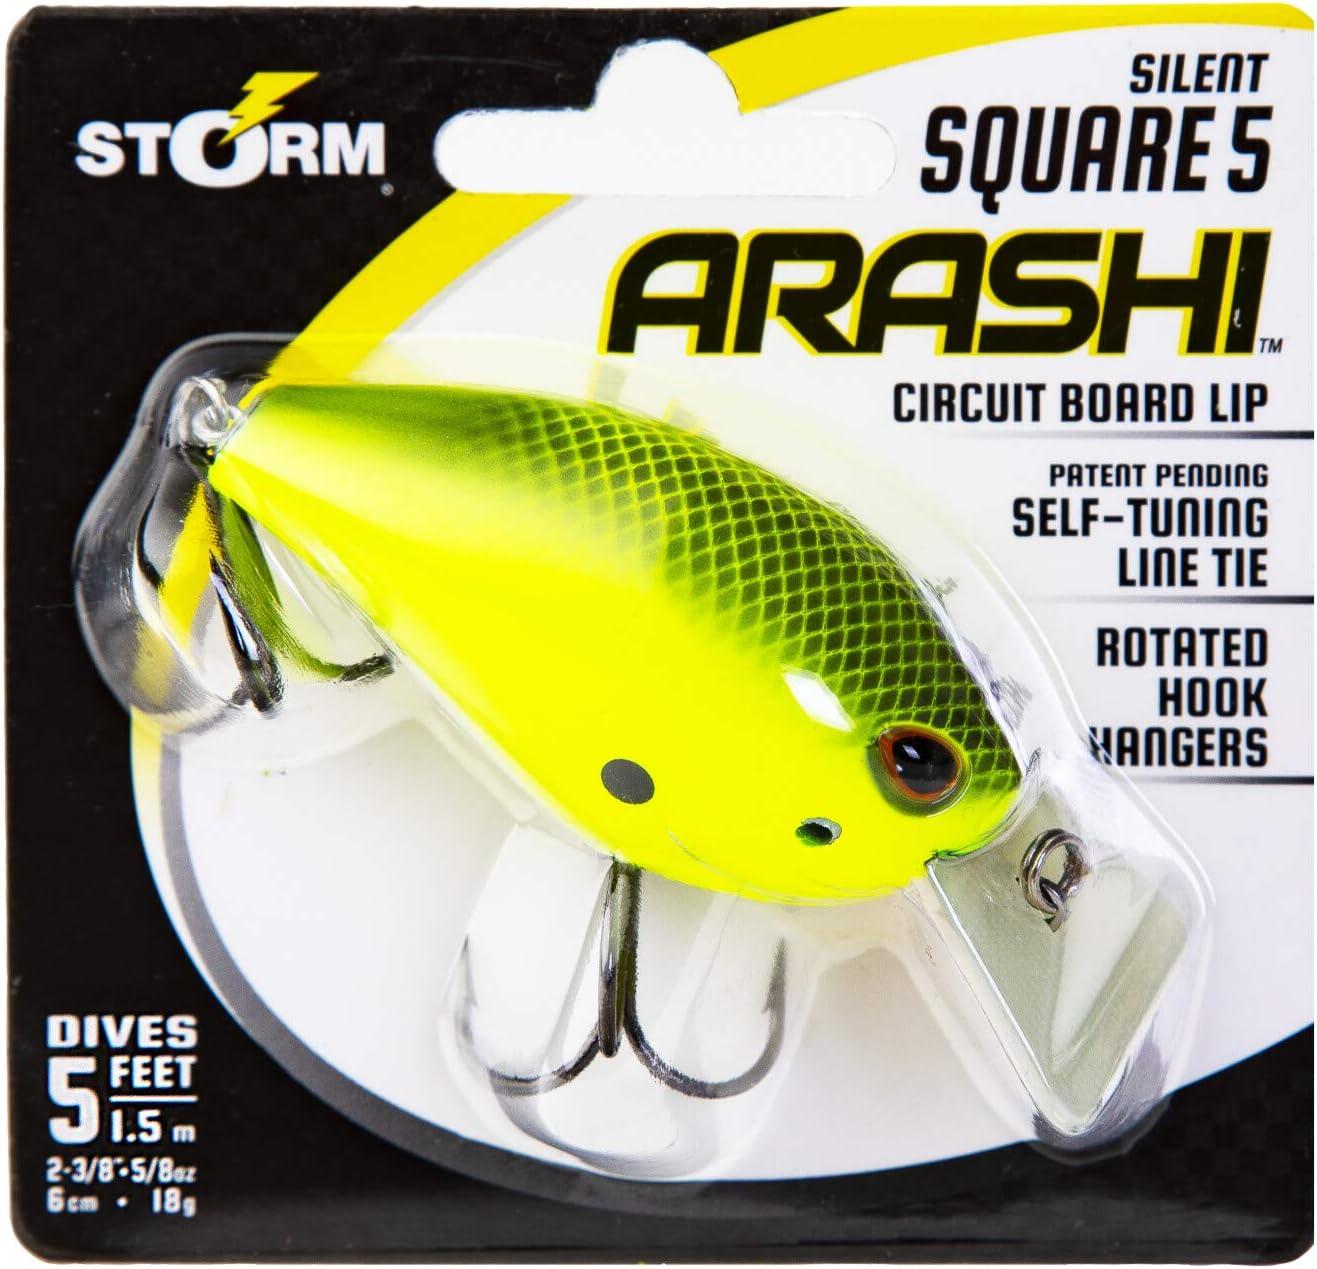 Storm Arashi Silent Square Asqs05 685 Blue Back Herring X3 Baits for sale online